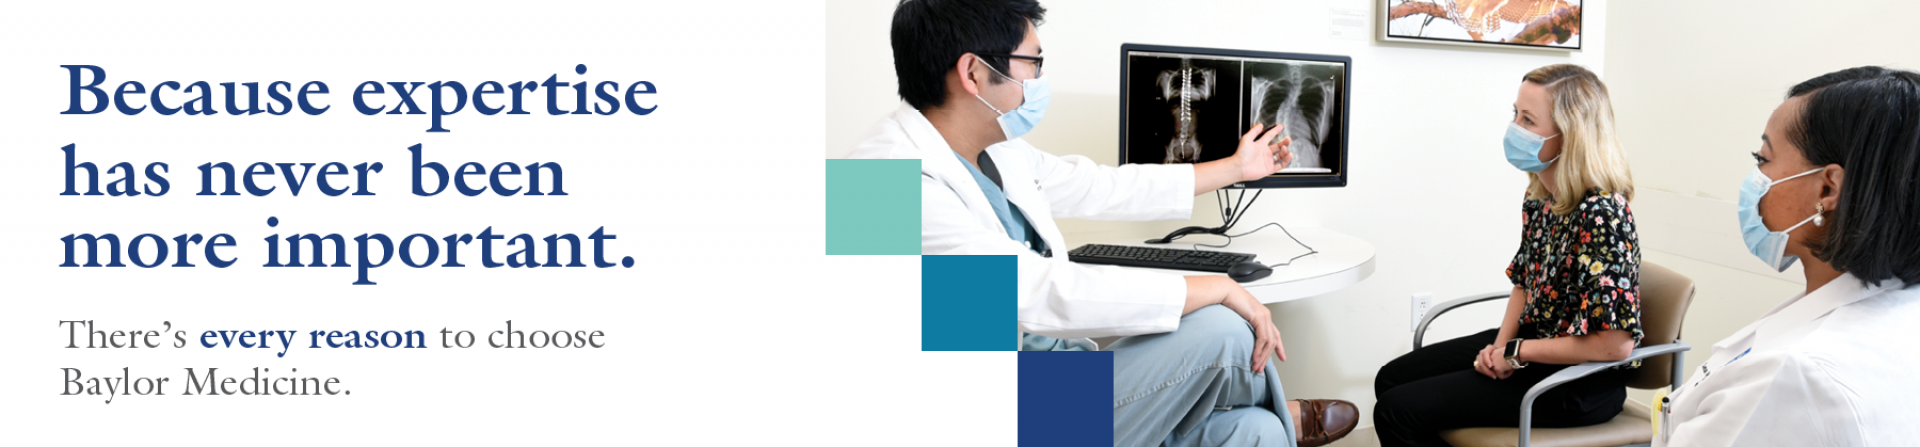 Baylor Medicine Healthcare